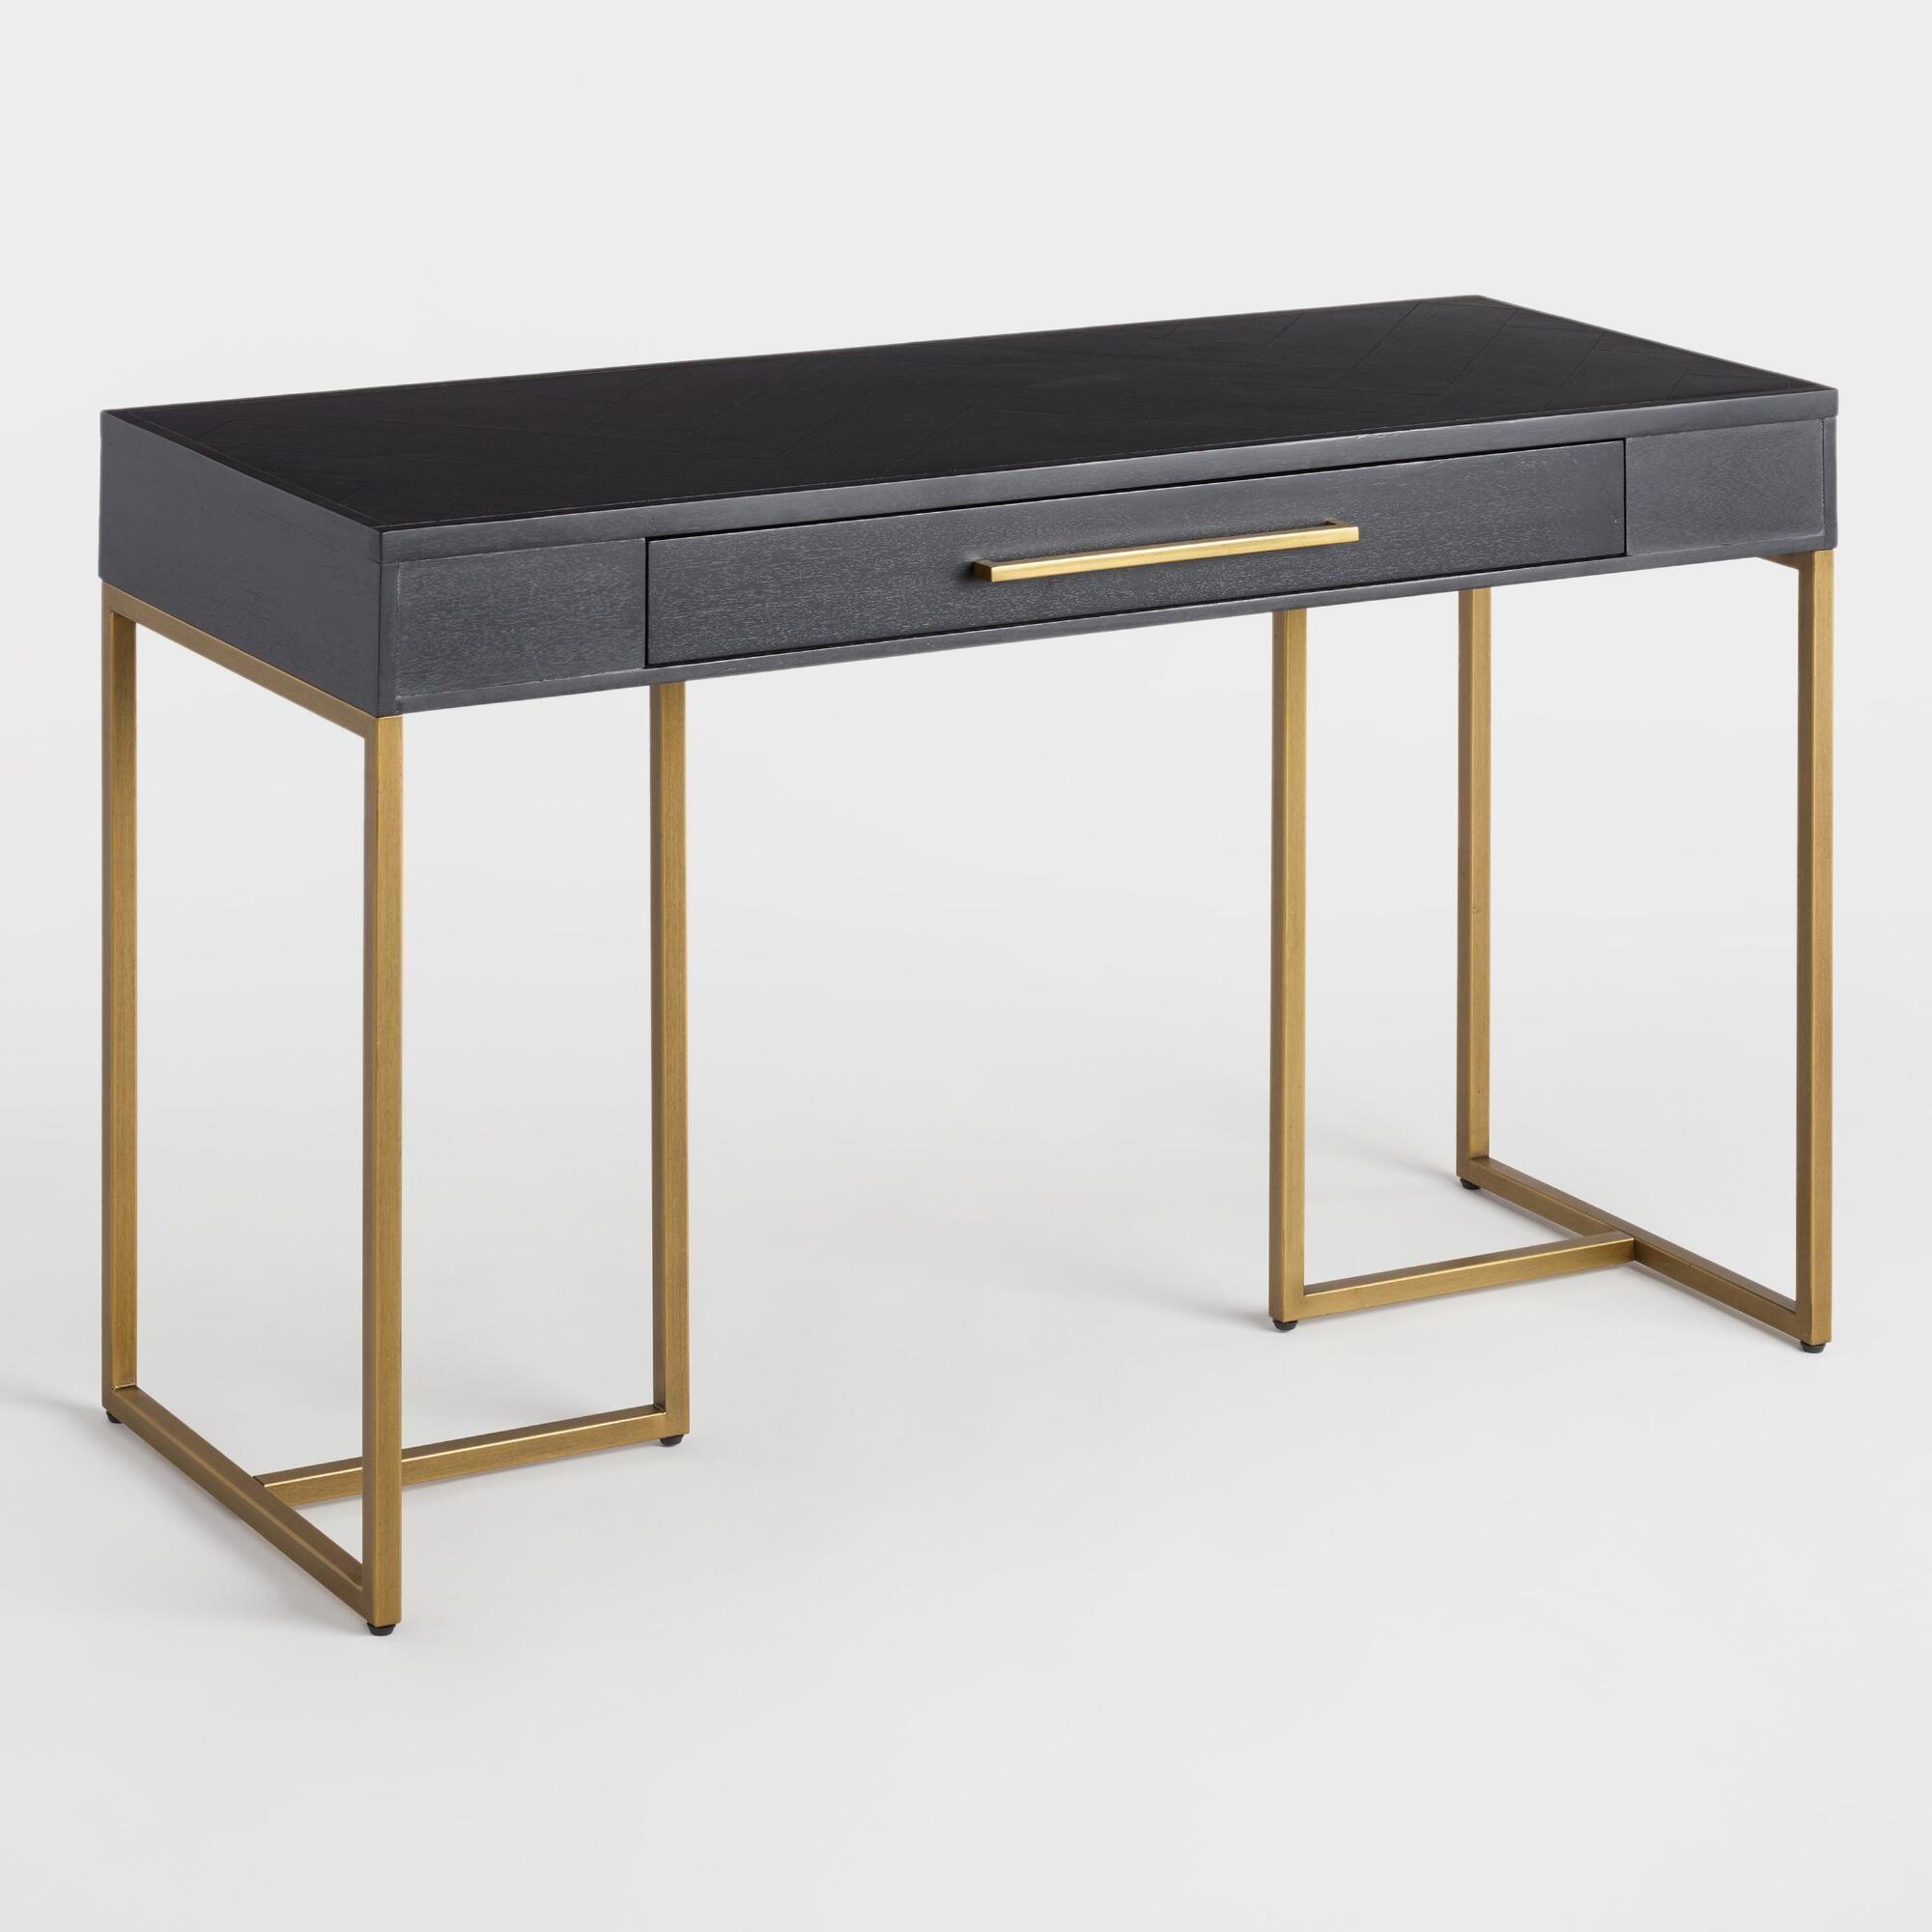 Herringbone Wood Wayde Desk by World Market